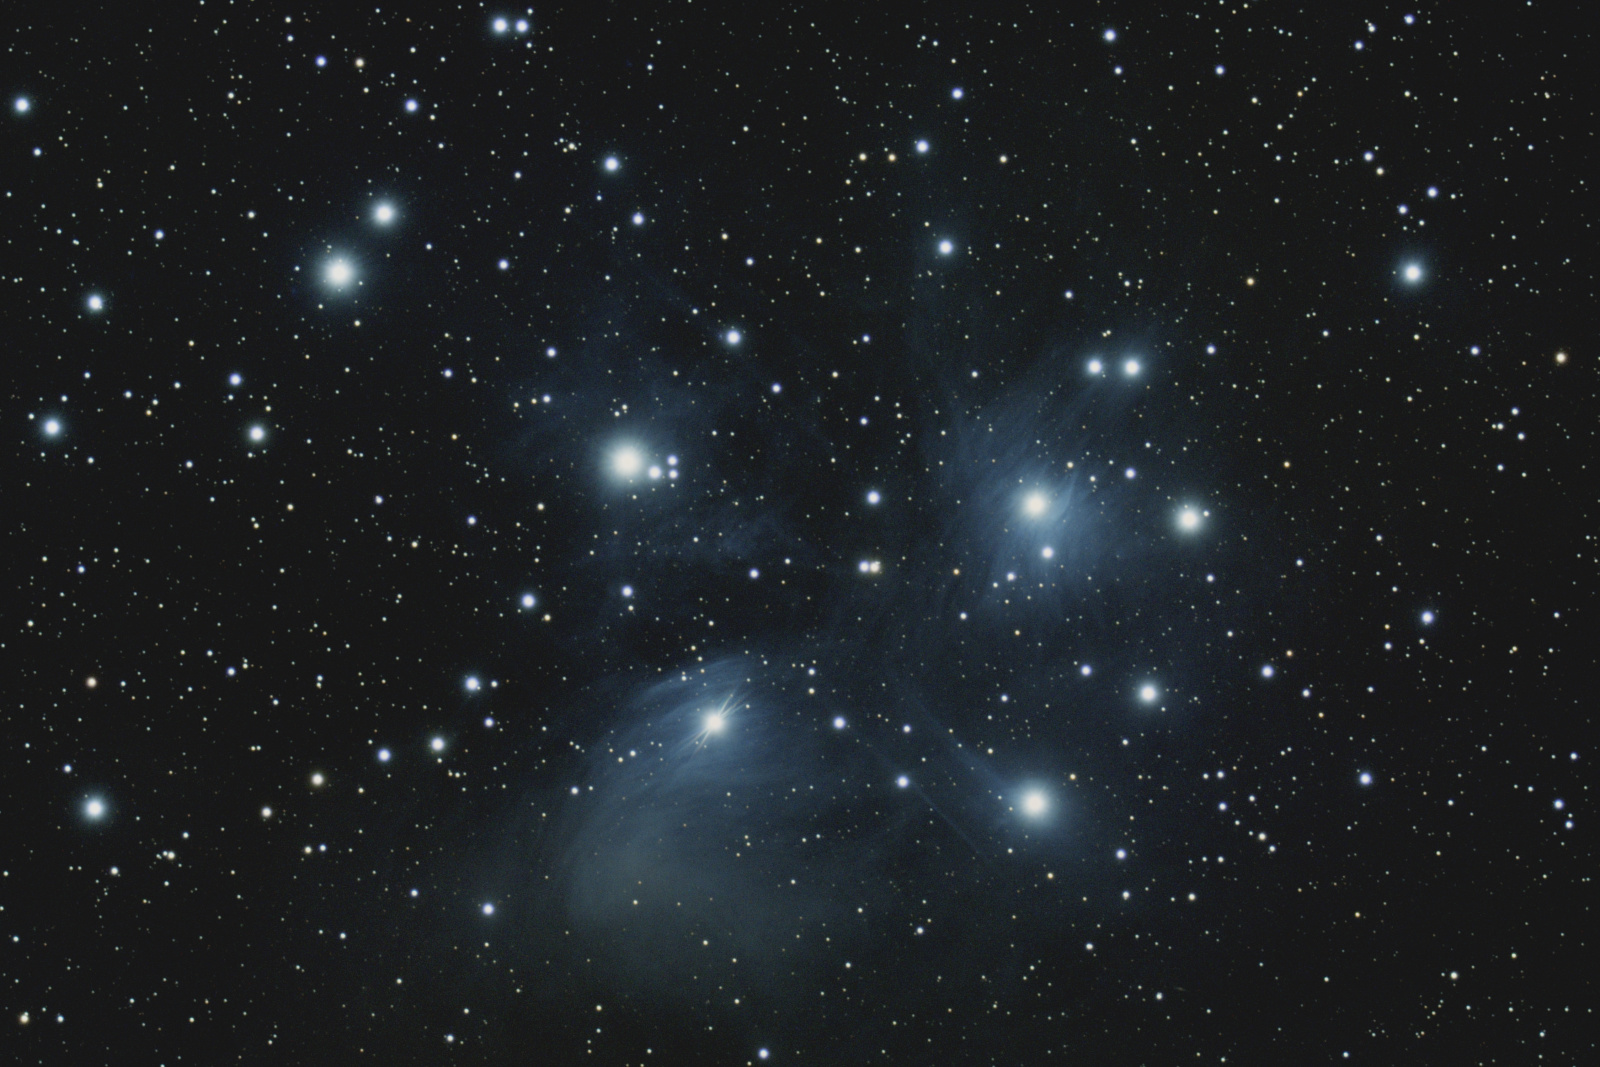 M45.thumb.jpg.616efa779963585c621077b973a0b3f7.jpg